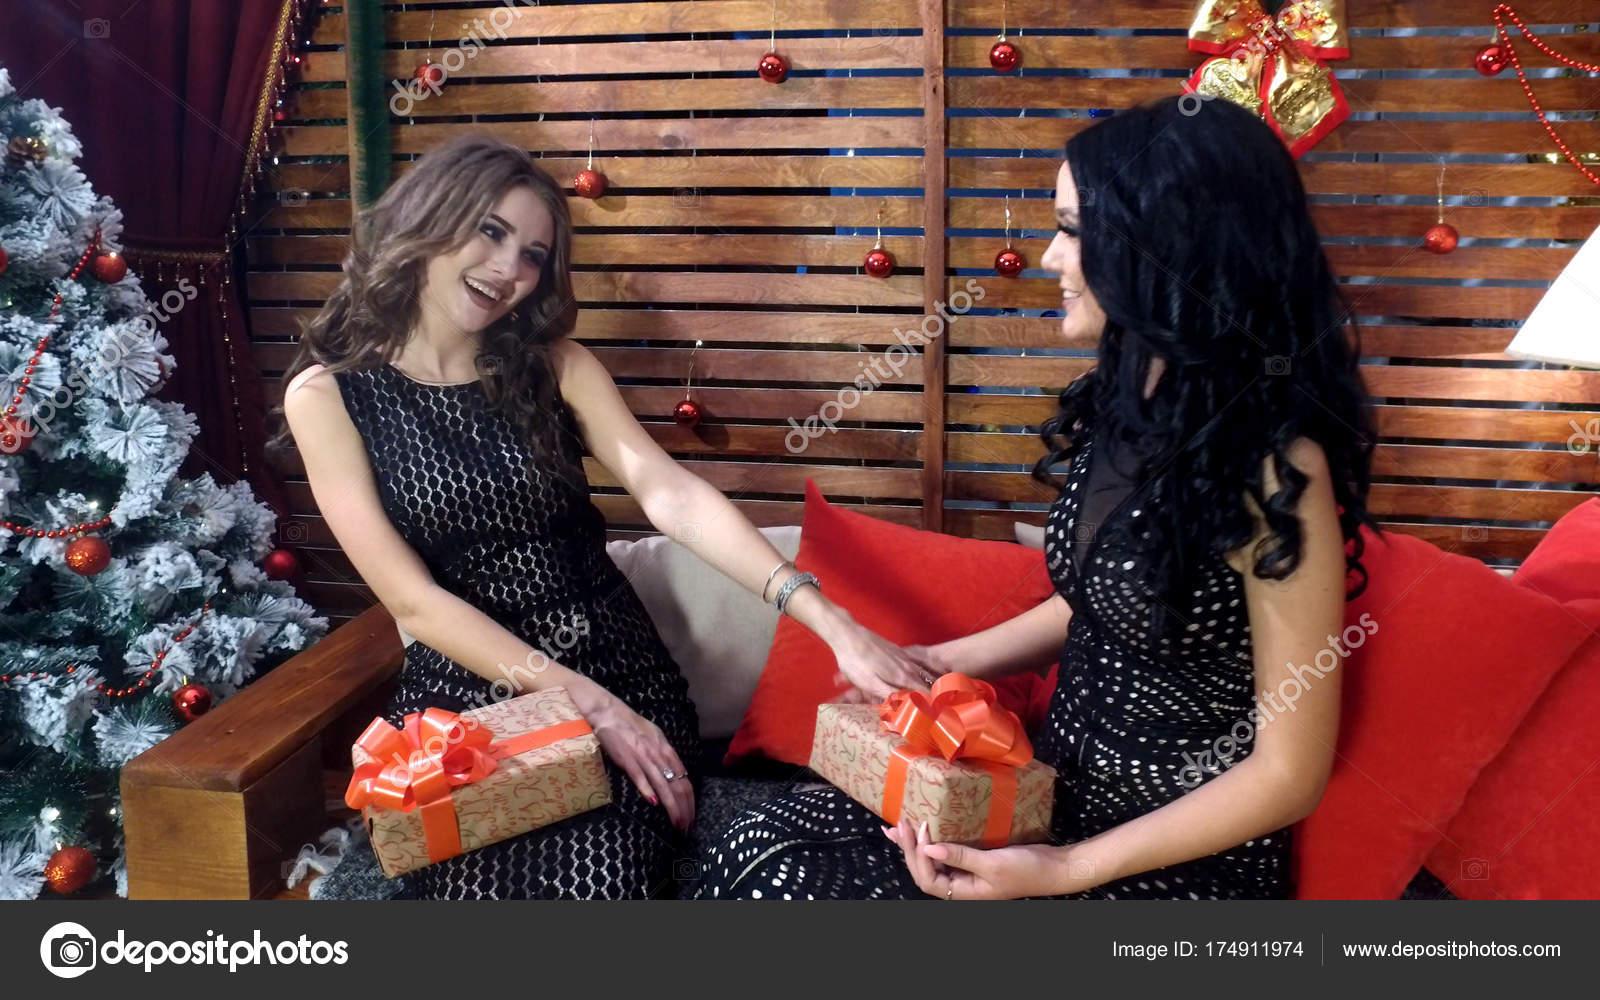 4d36a8397096 Δύο όμορφα κορίτσια με μακριά μαλλιά μαύρα φορέματα μιλάμε και ...